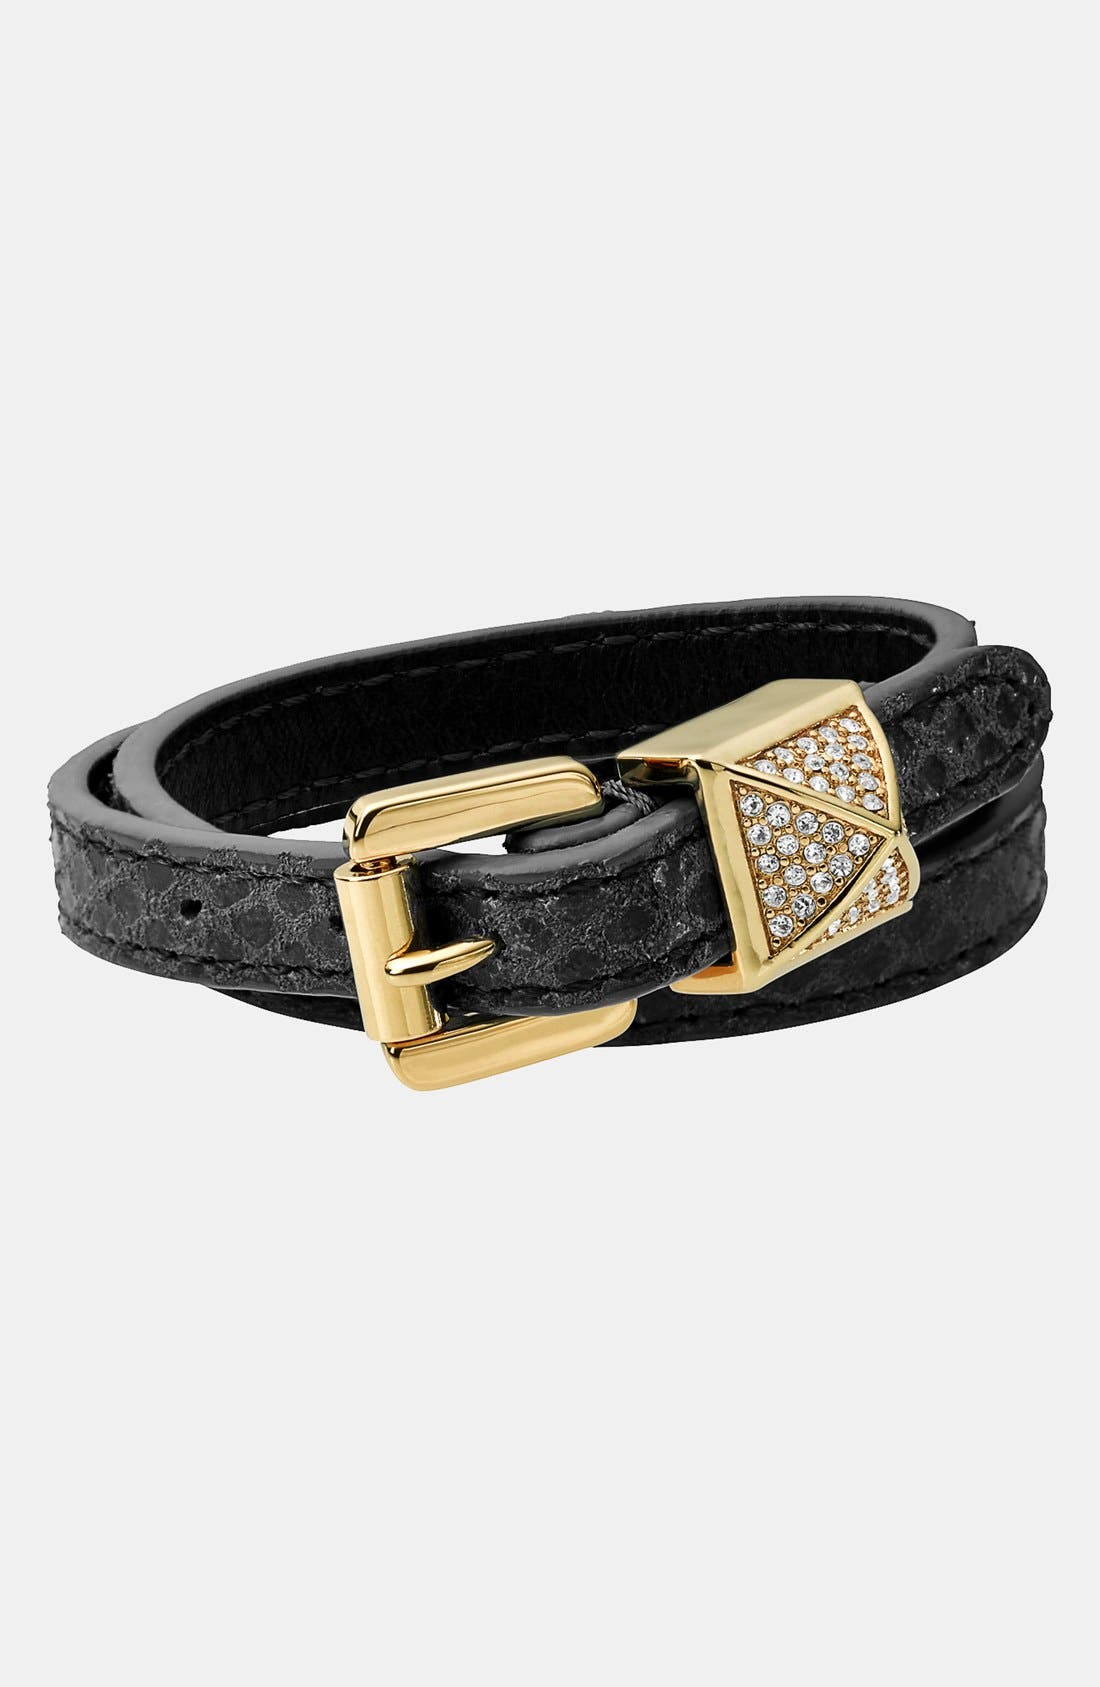 Alternate Image 1 Selected - Michael Kors 'Glam Rock' Leather Wrap Bracelet